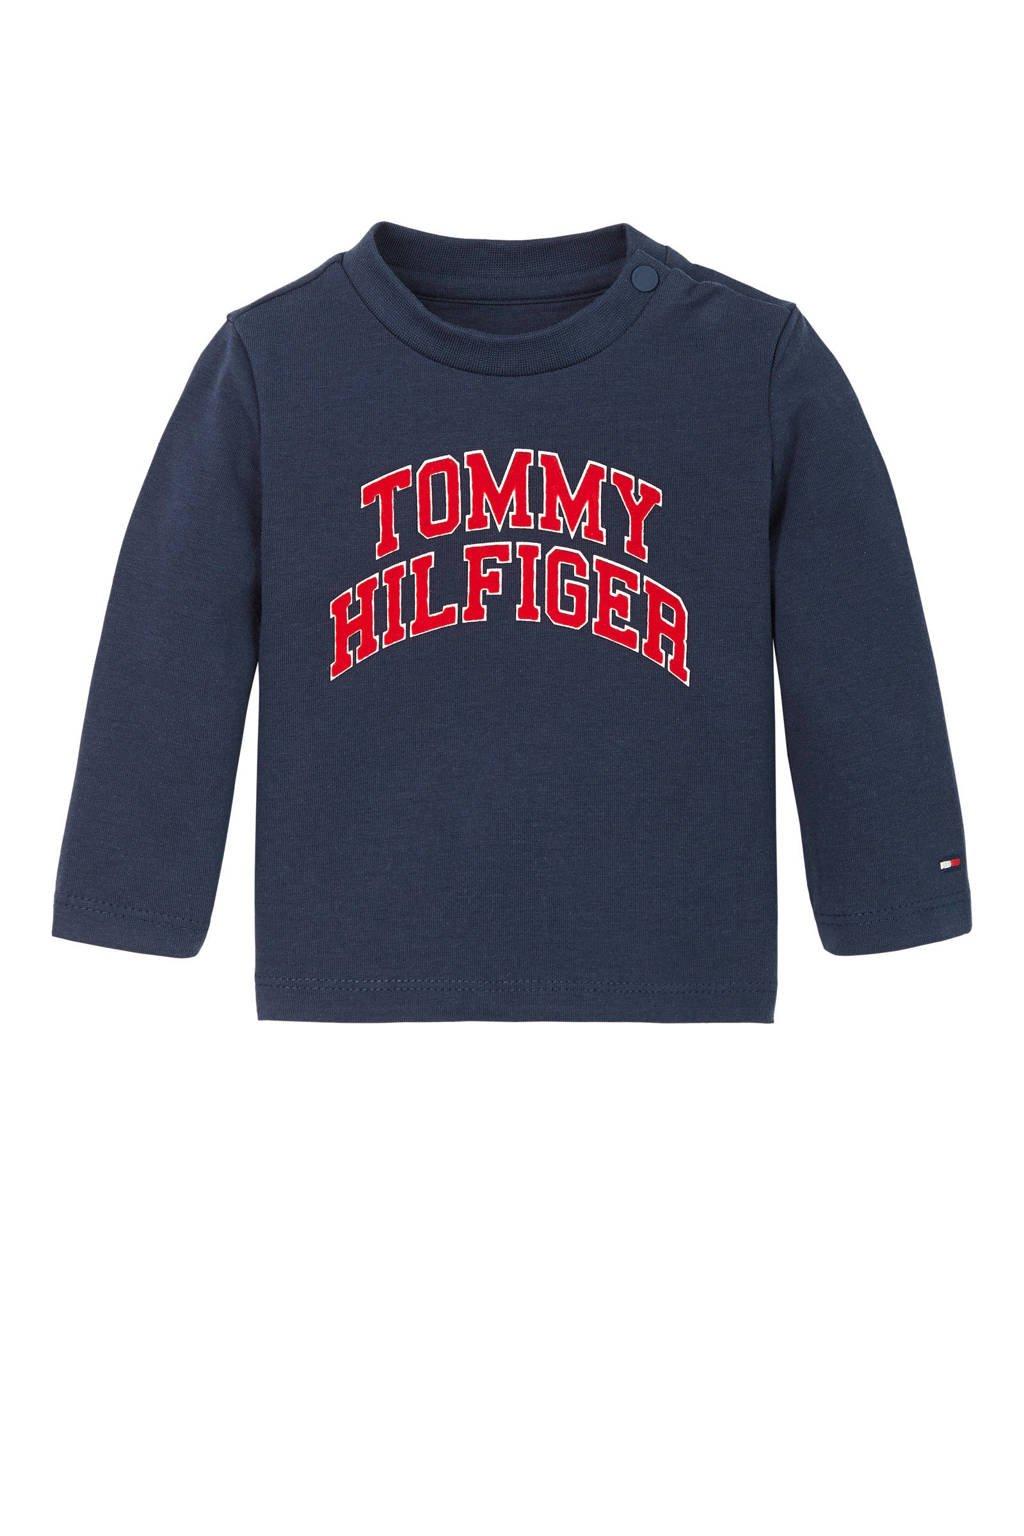 Tommy Hilfiger baby longsleeve met logo donkerblauw, Donkerblauw